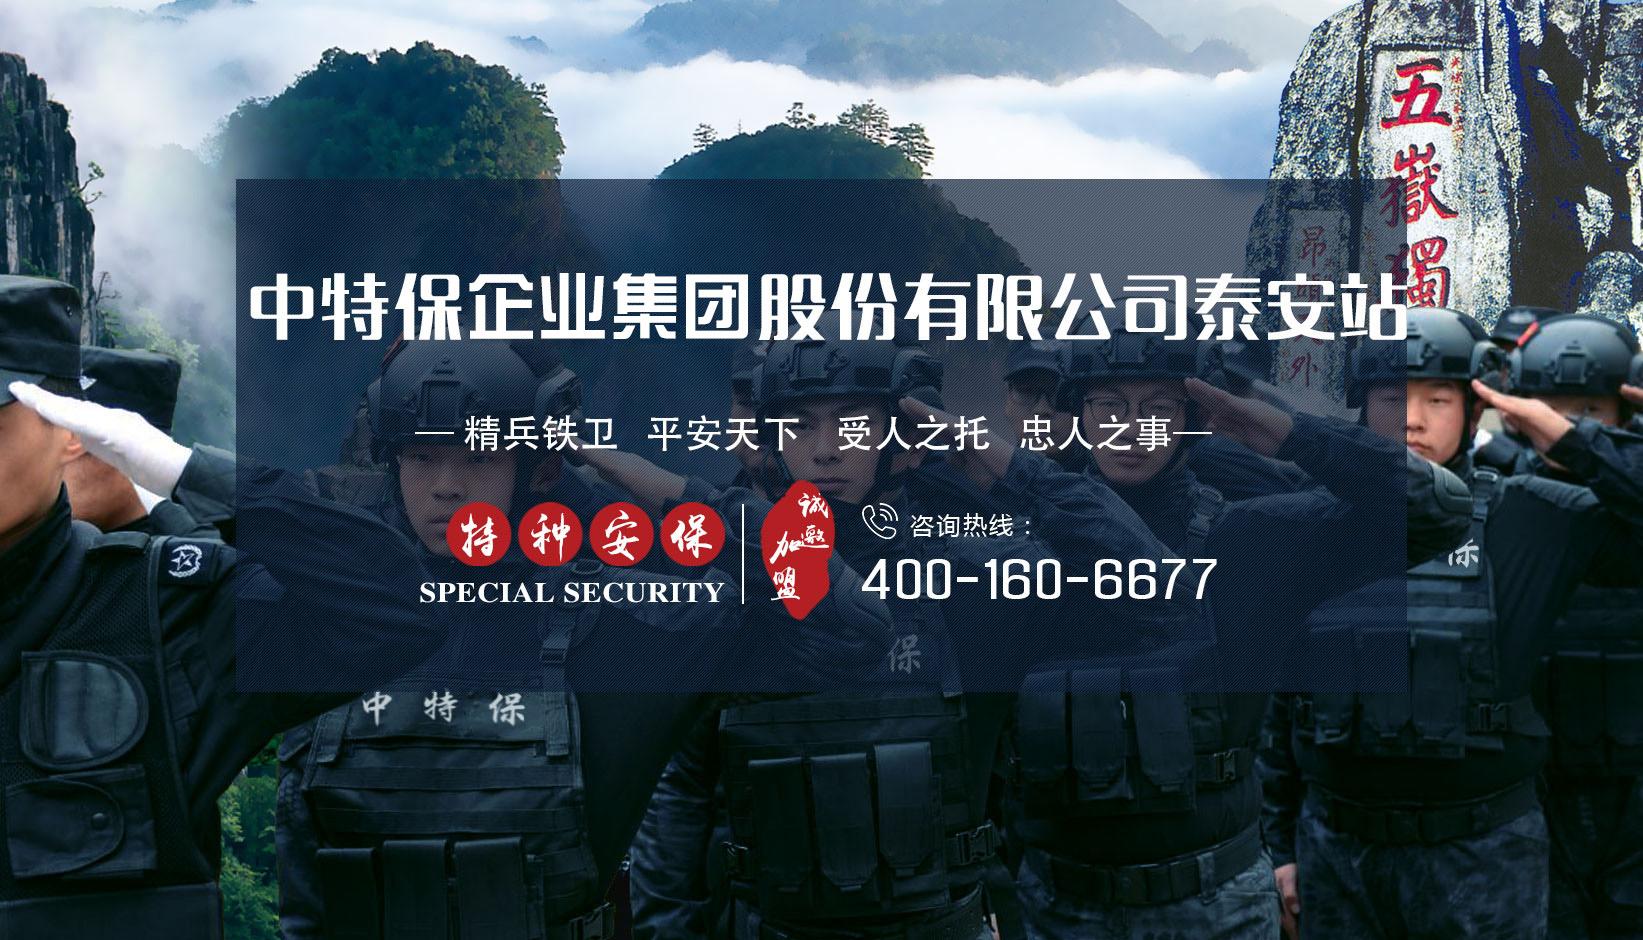 http://www.tazhongtebao.com/html/business/